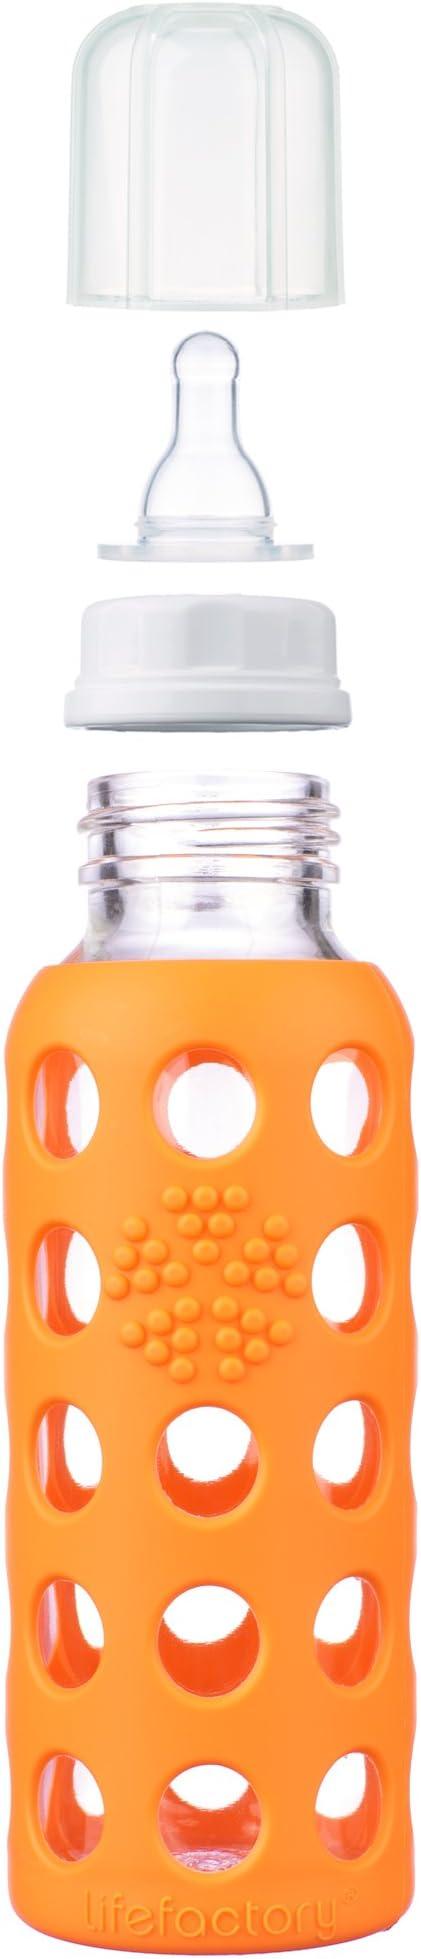 Lifefactory Babyflasche orange